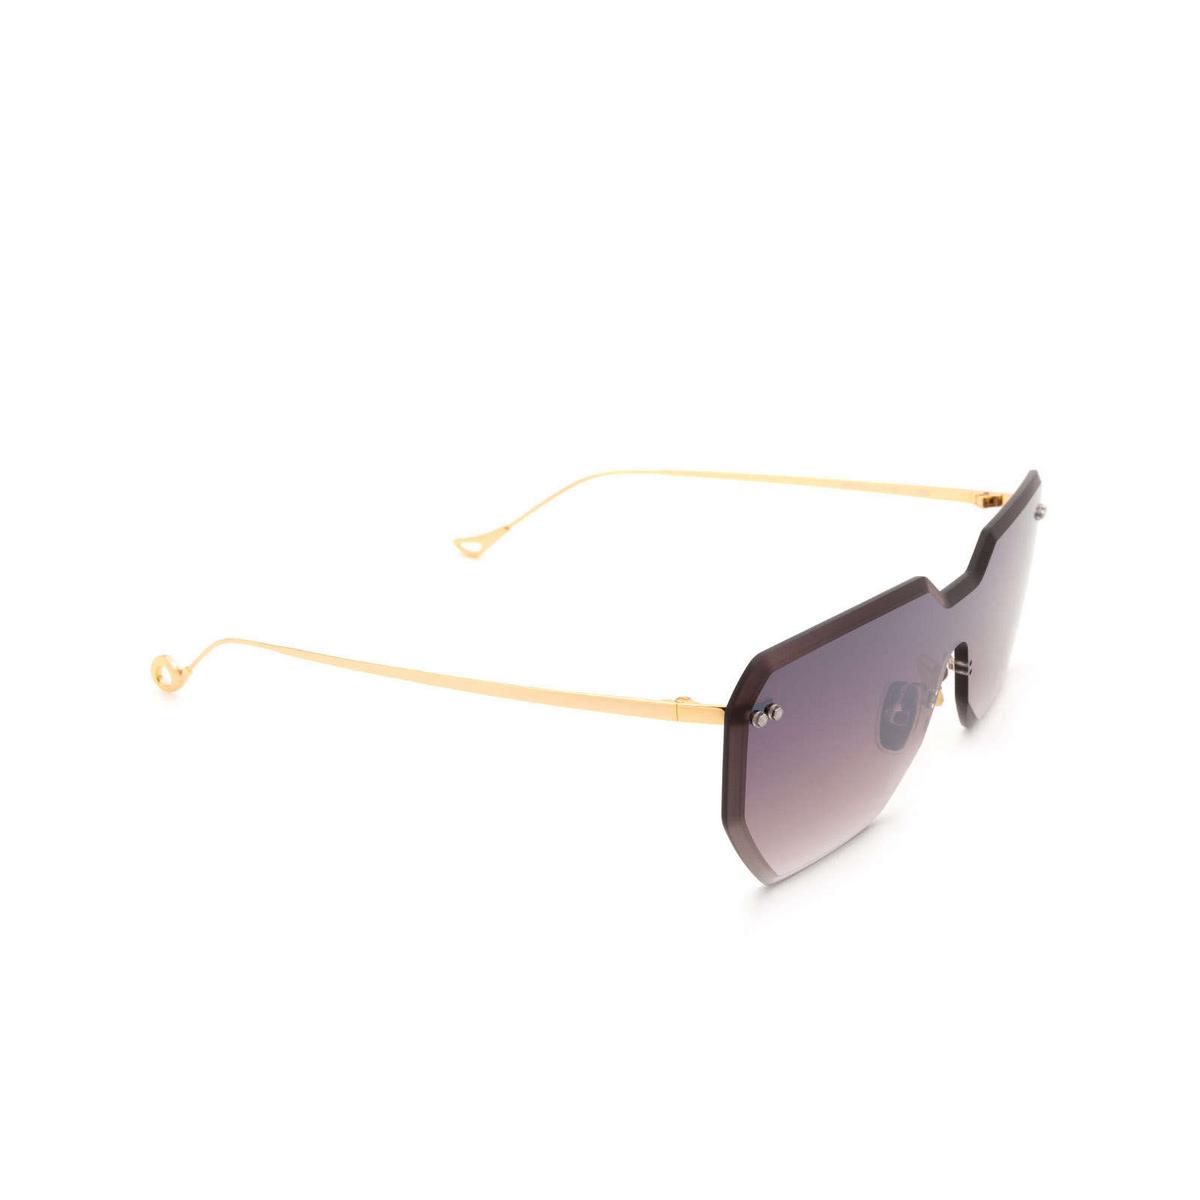 Eyepetizer® Mask Sunglasses: Brickel color Gold C.4-18F - three-quarters view.